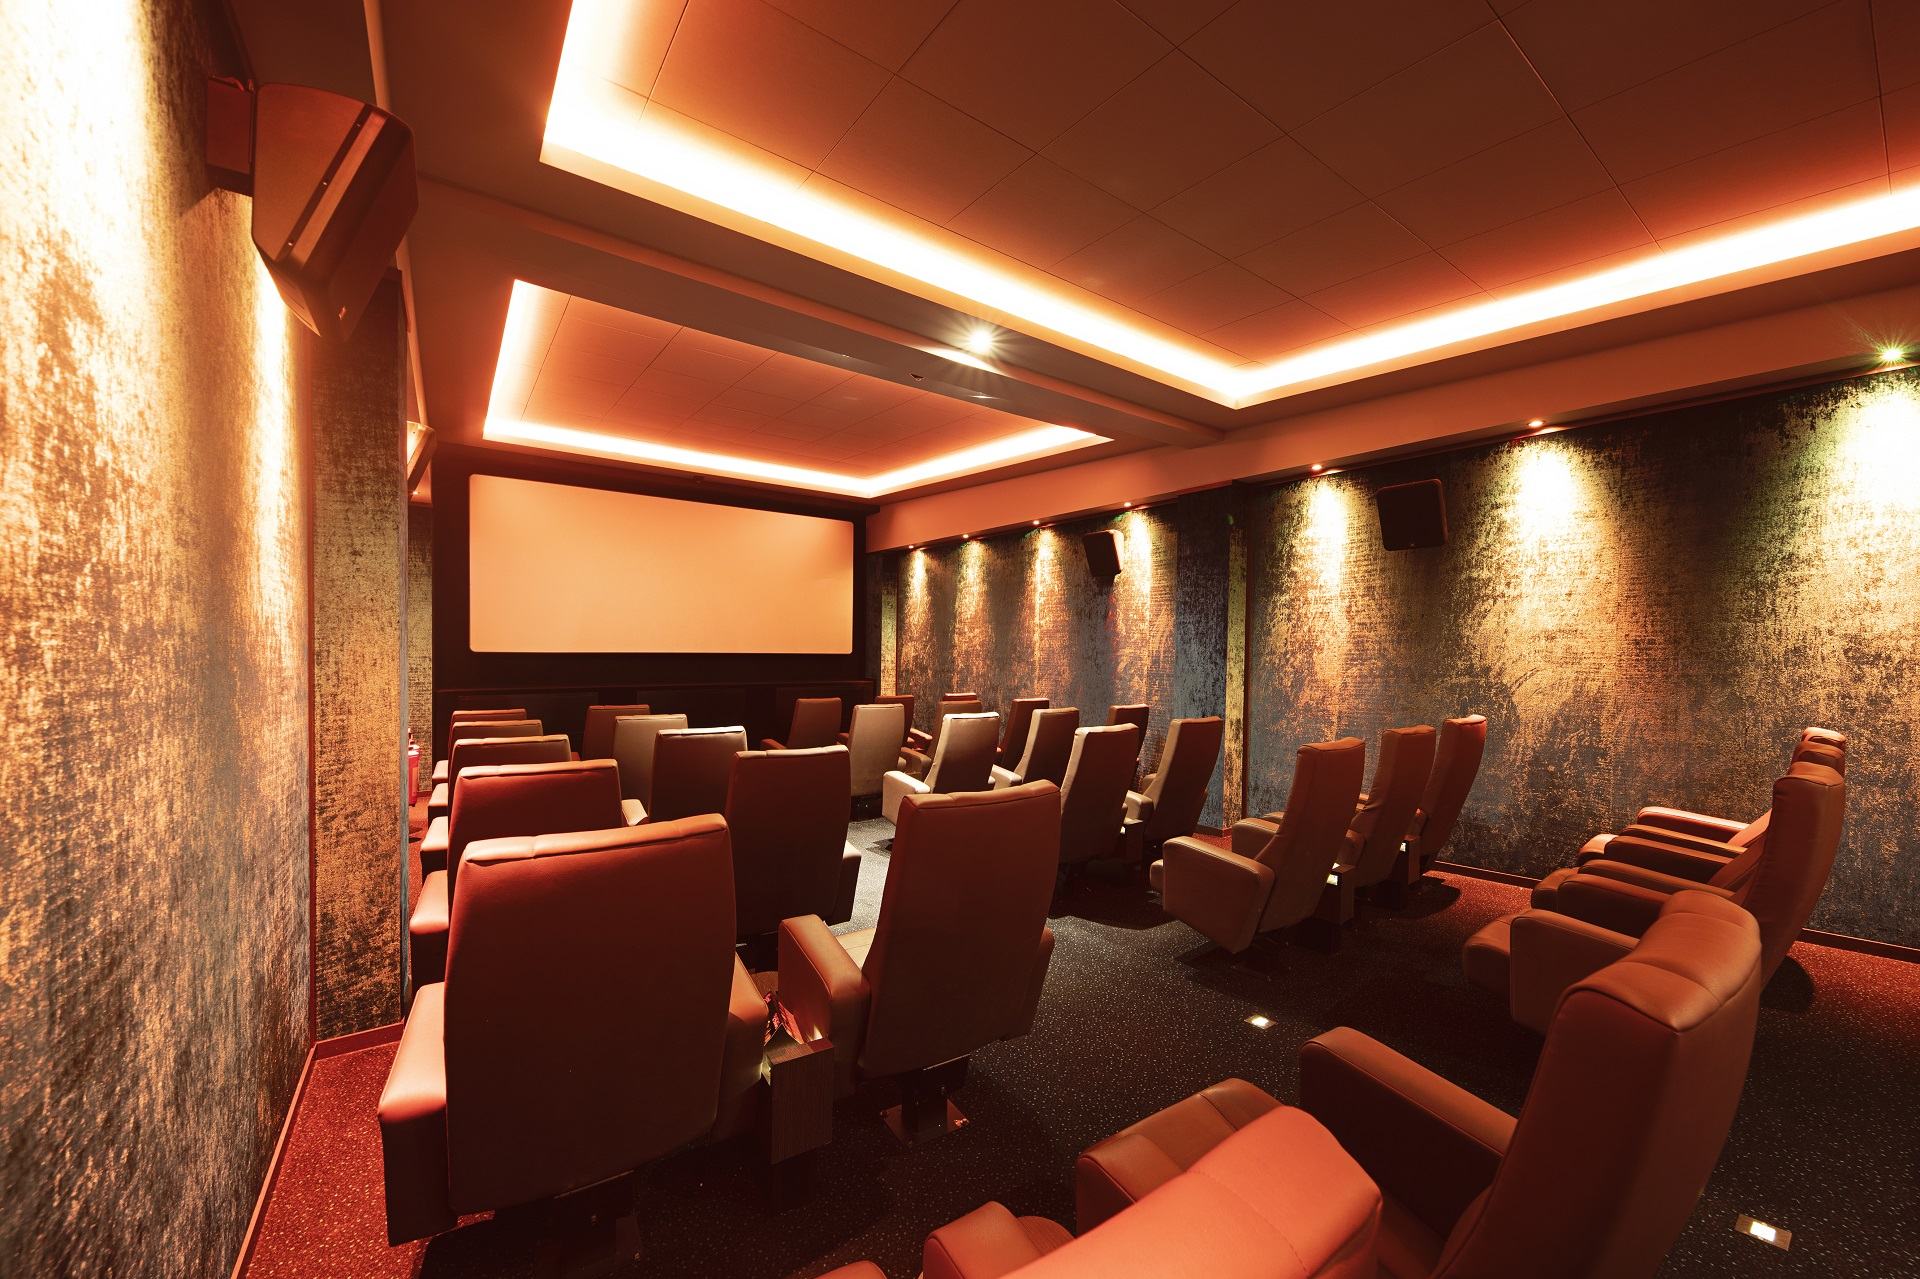 Kinocenter Leer